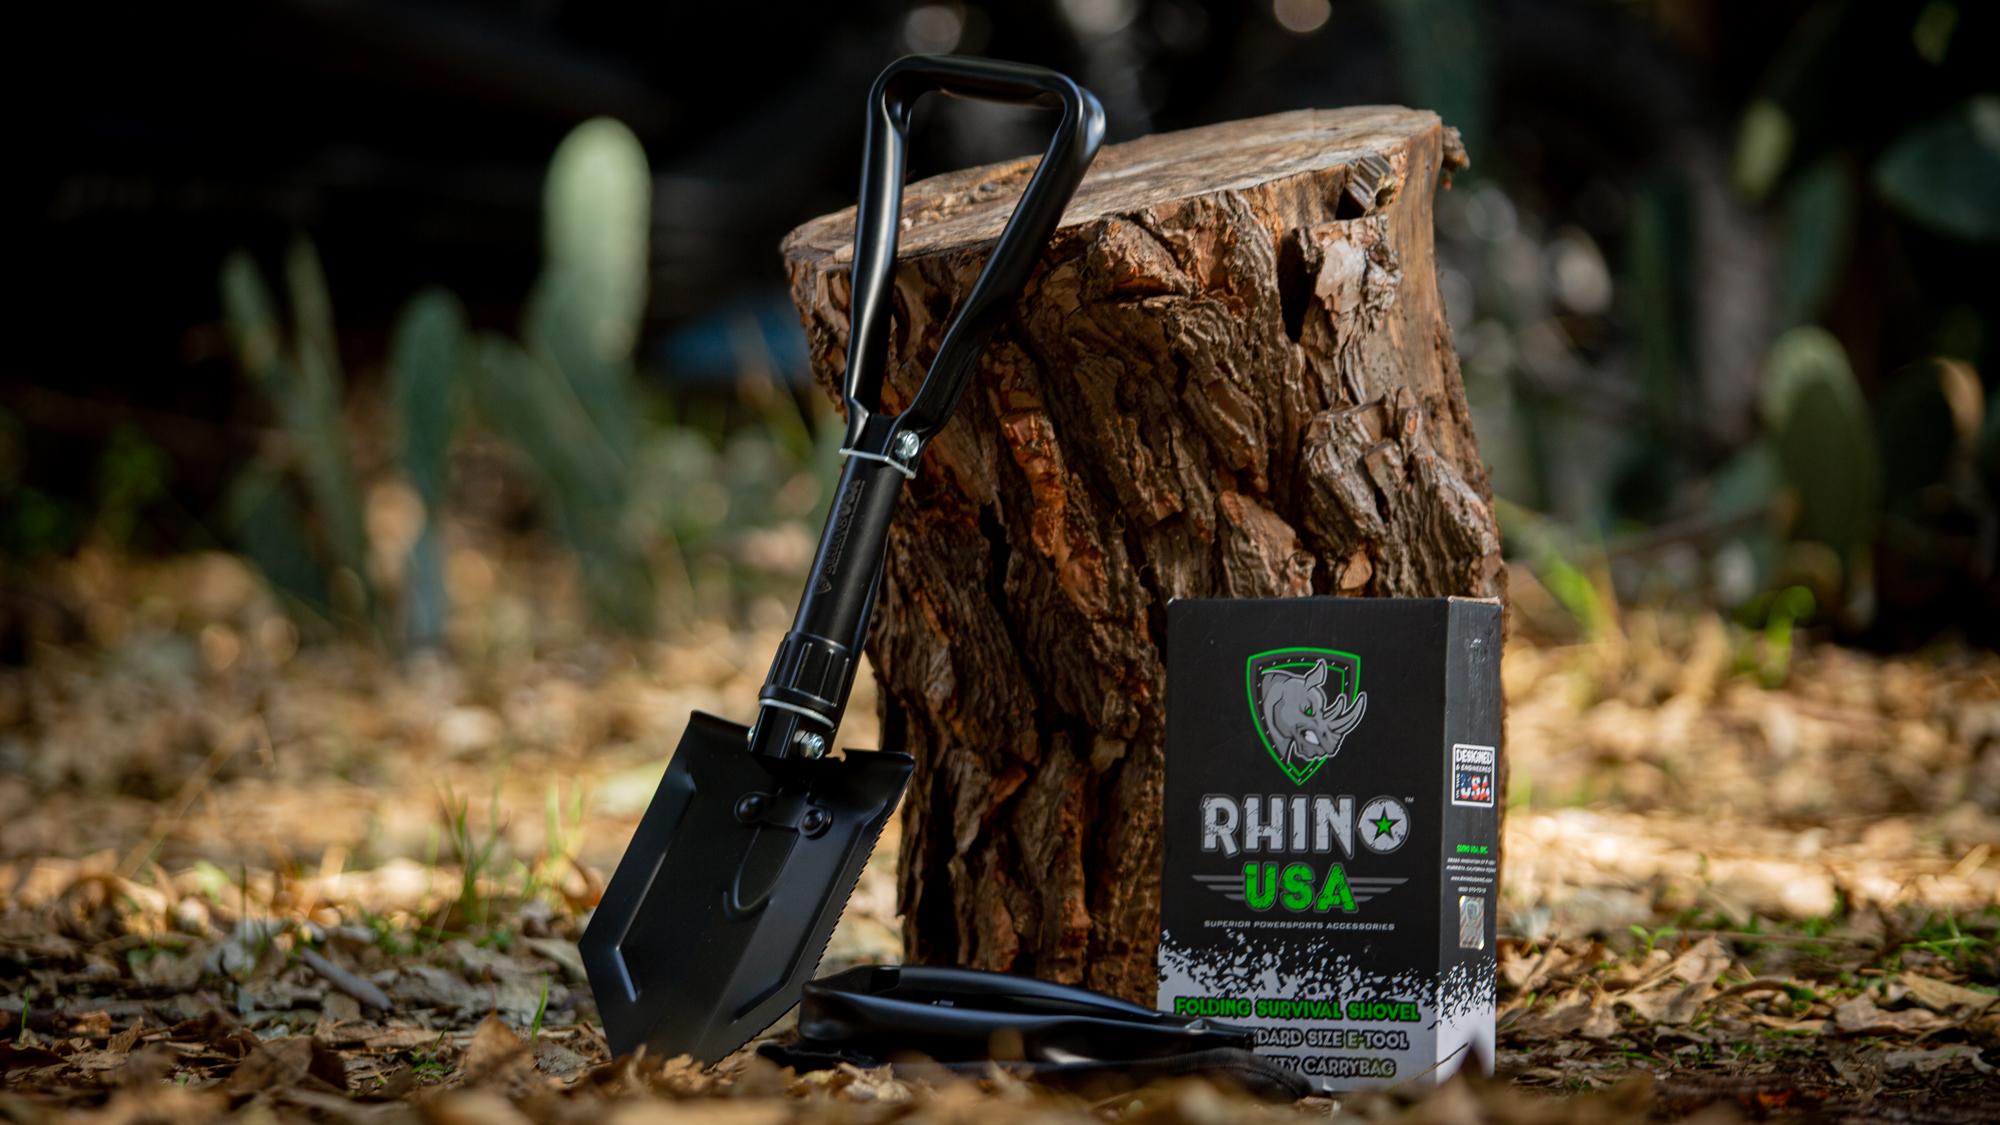 rhino usa folding survival shovel 01 1